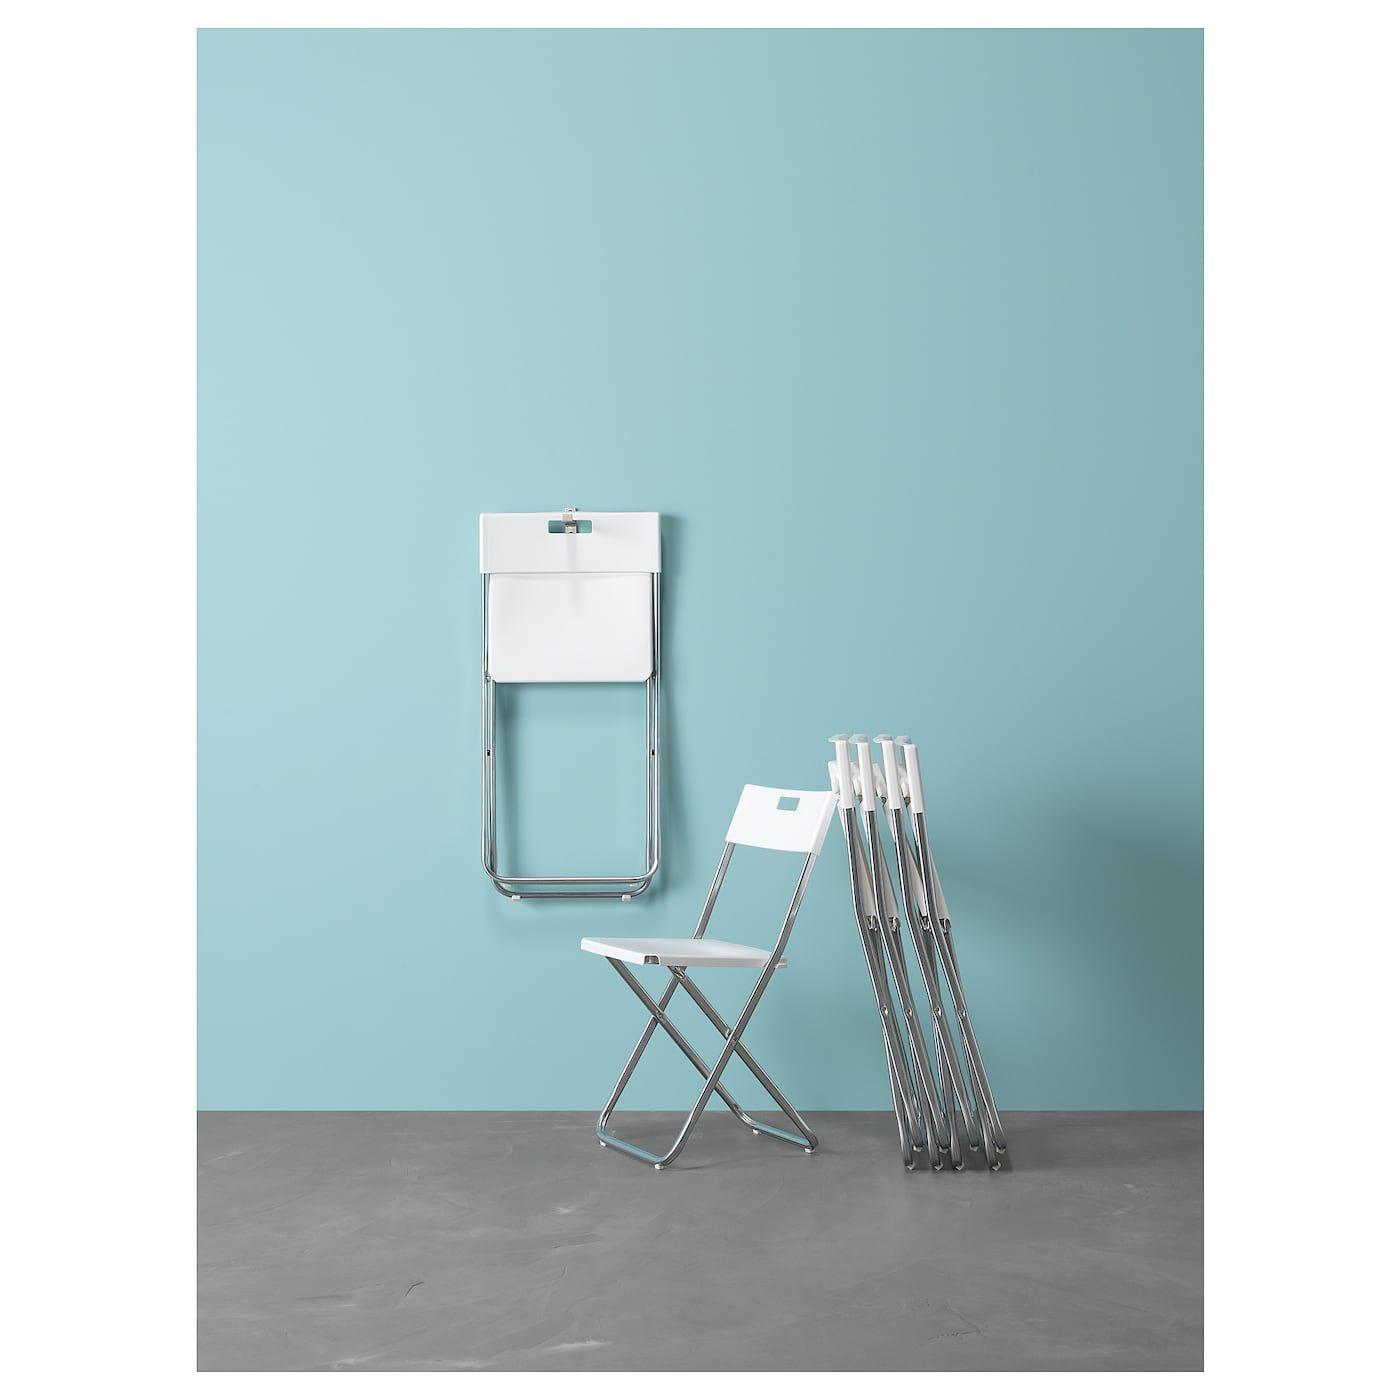 Gunde Folding Chair White In 2020 Folding Chair Chair